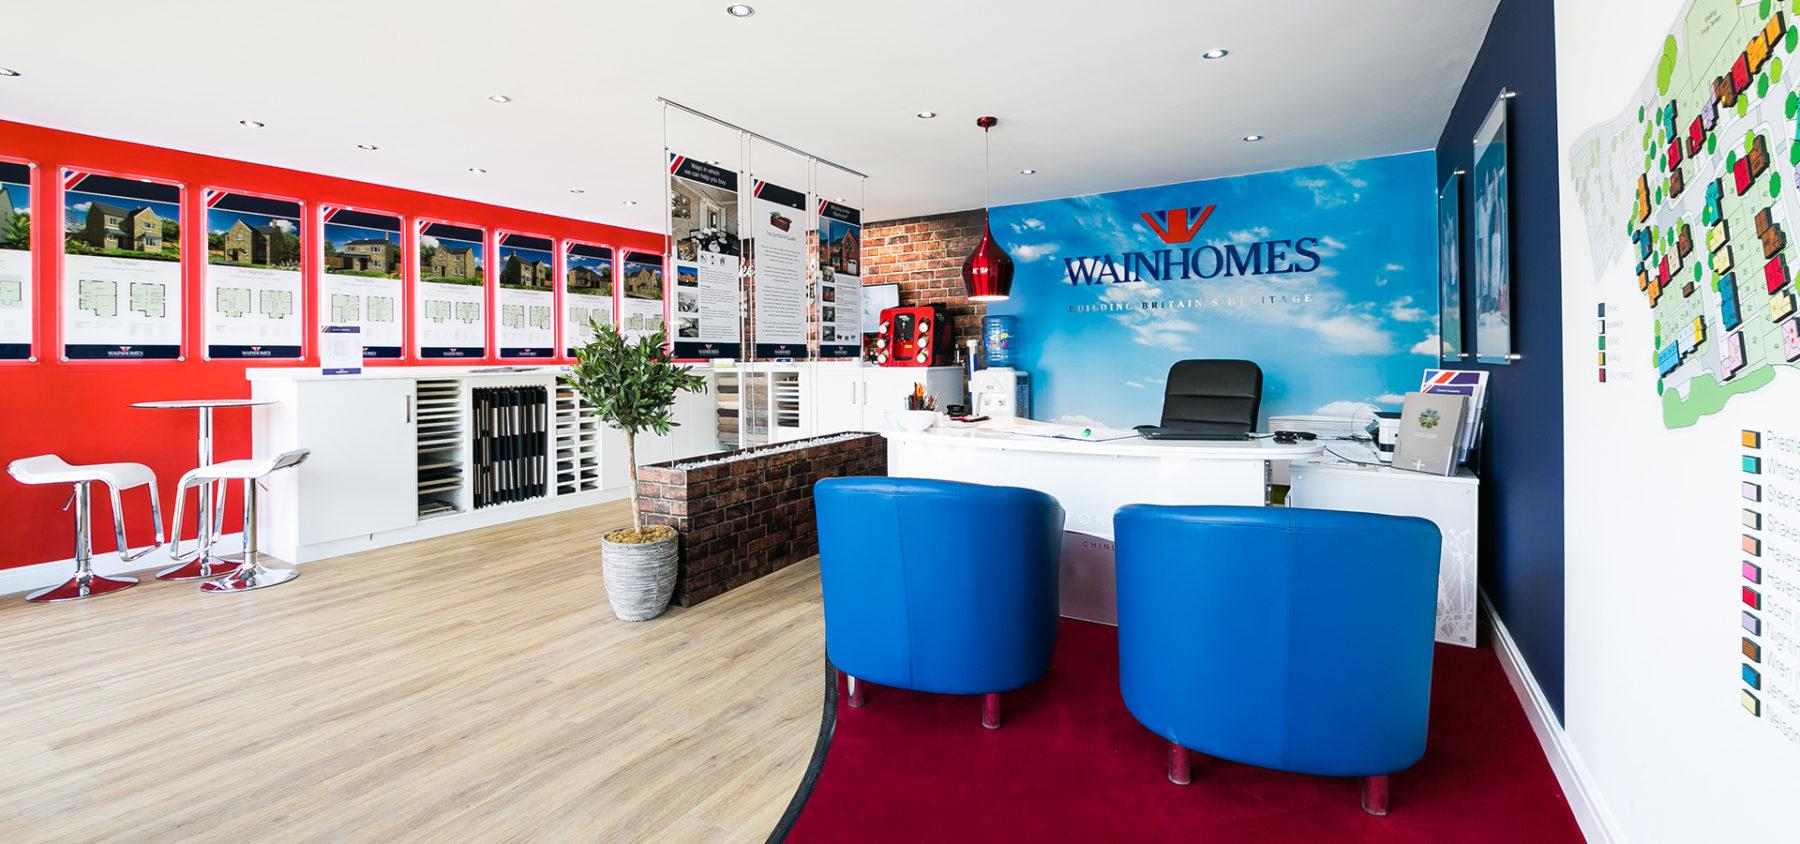 Wainhomes sales office